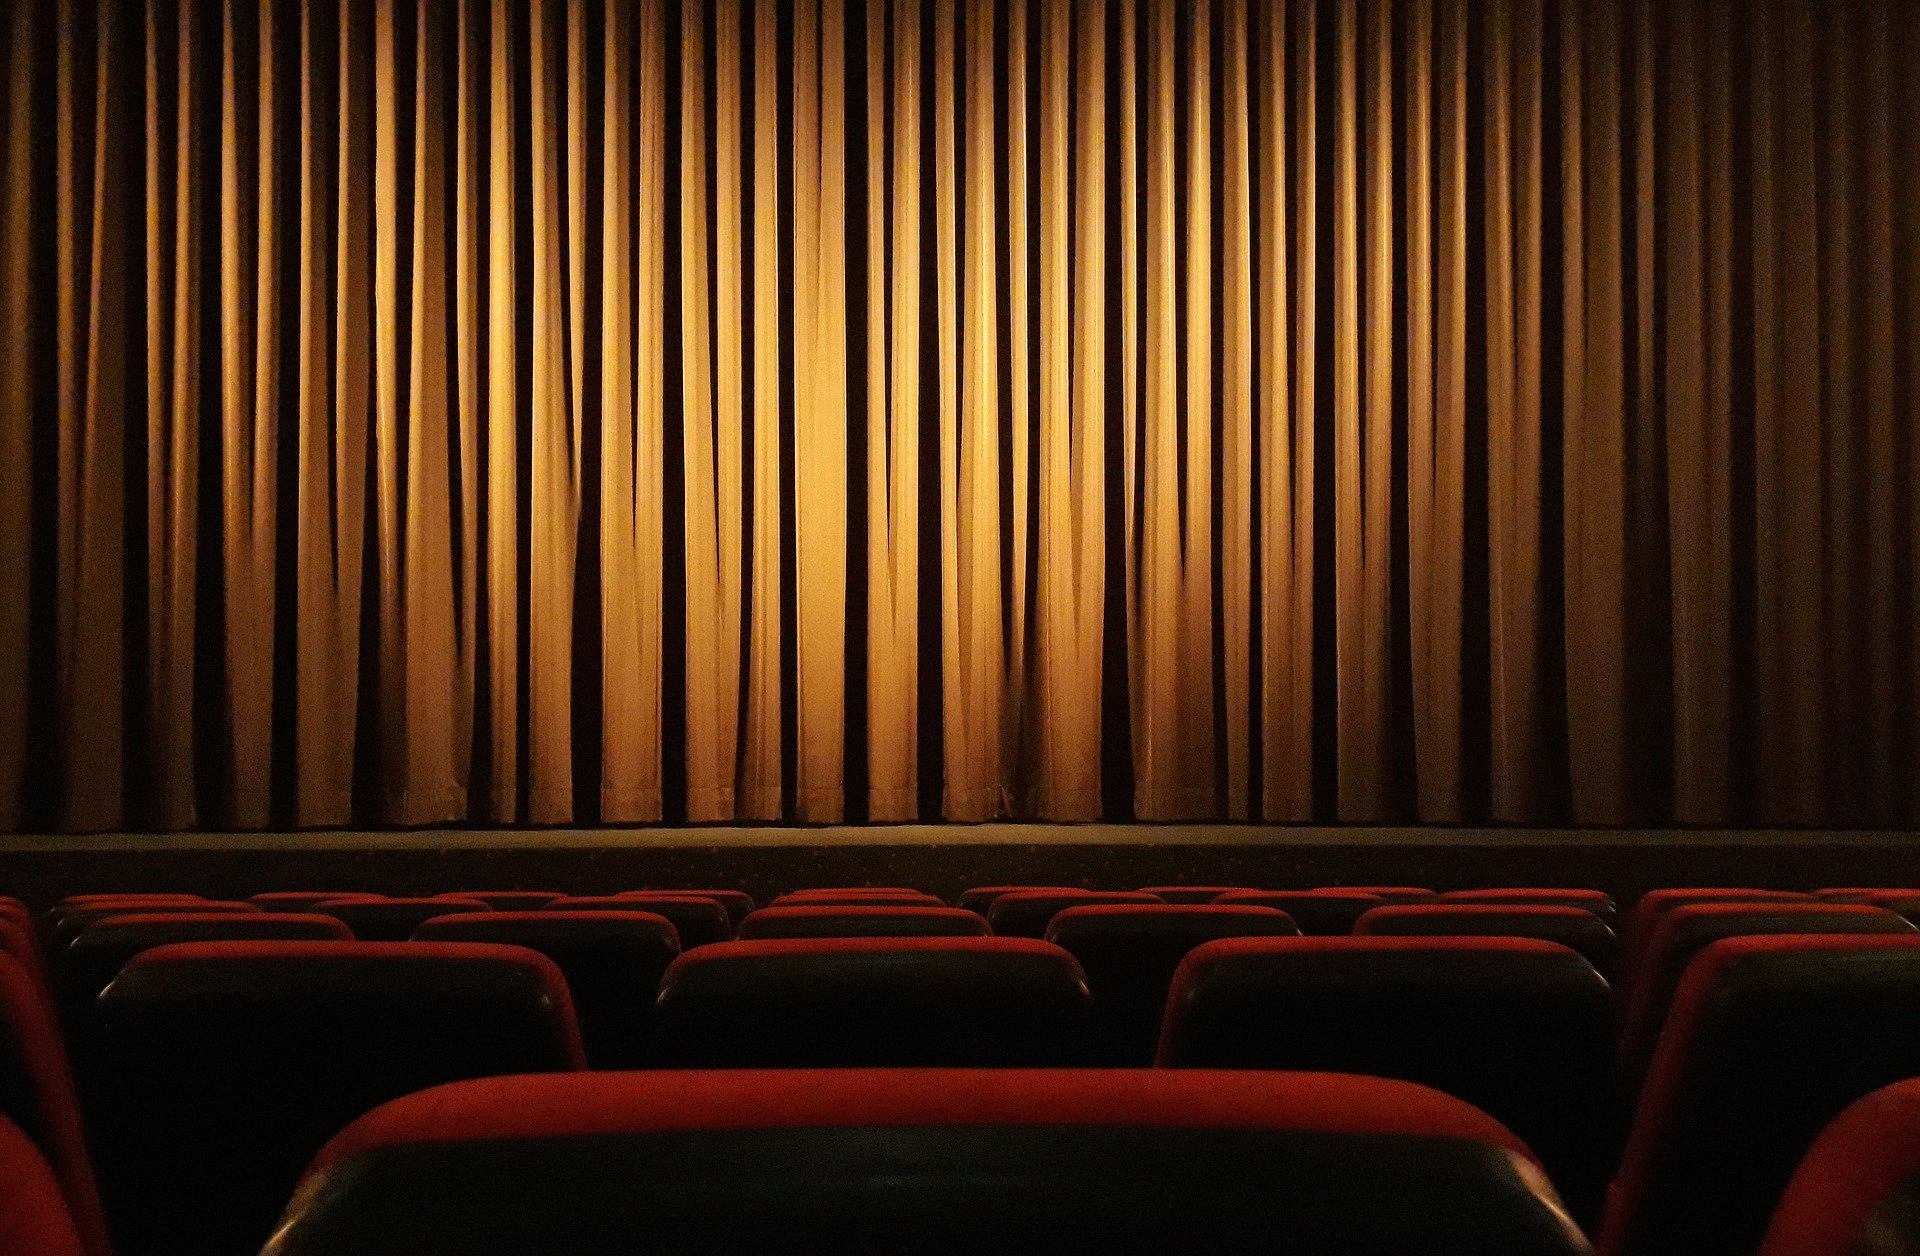 Bremen Kino Programm